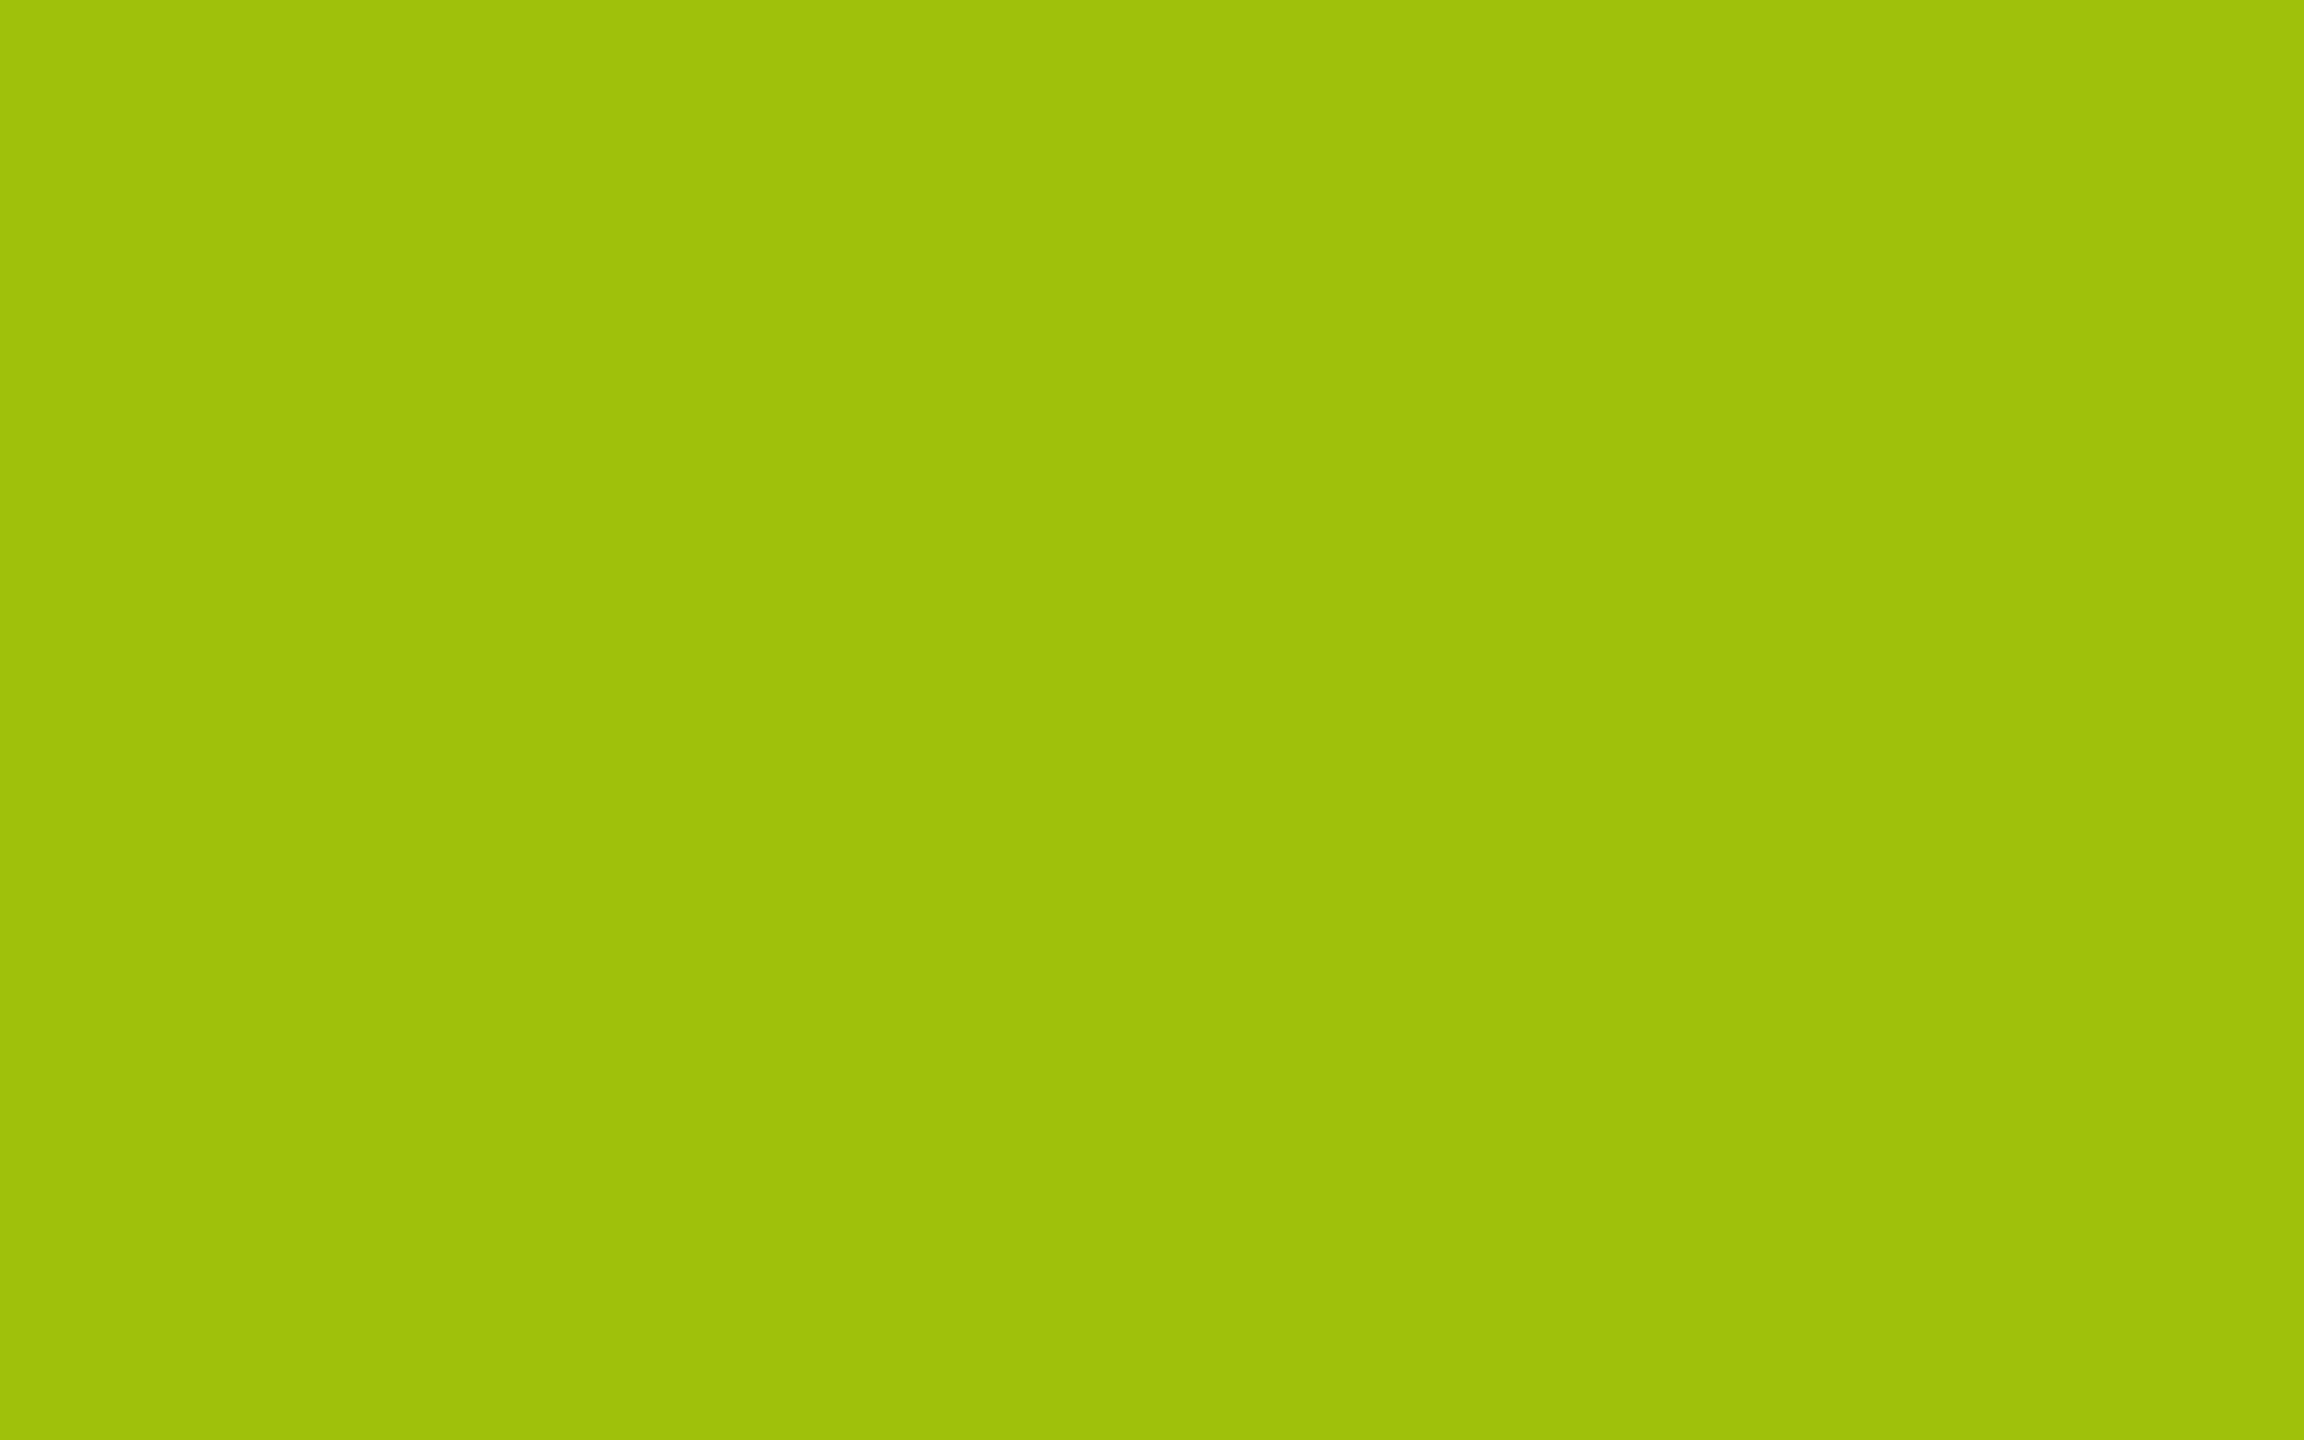 2304x1440 Limerick Solid Color Background